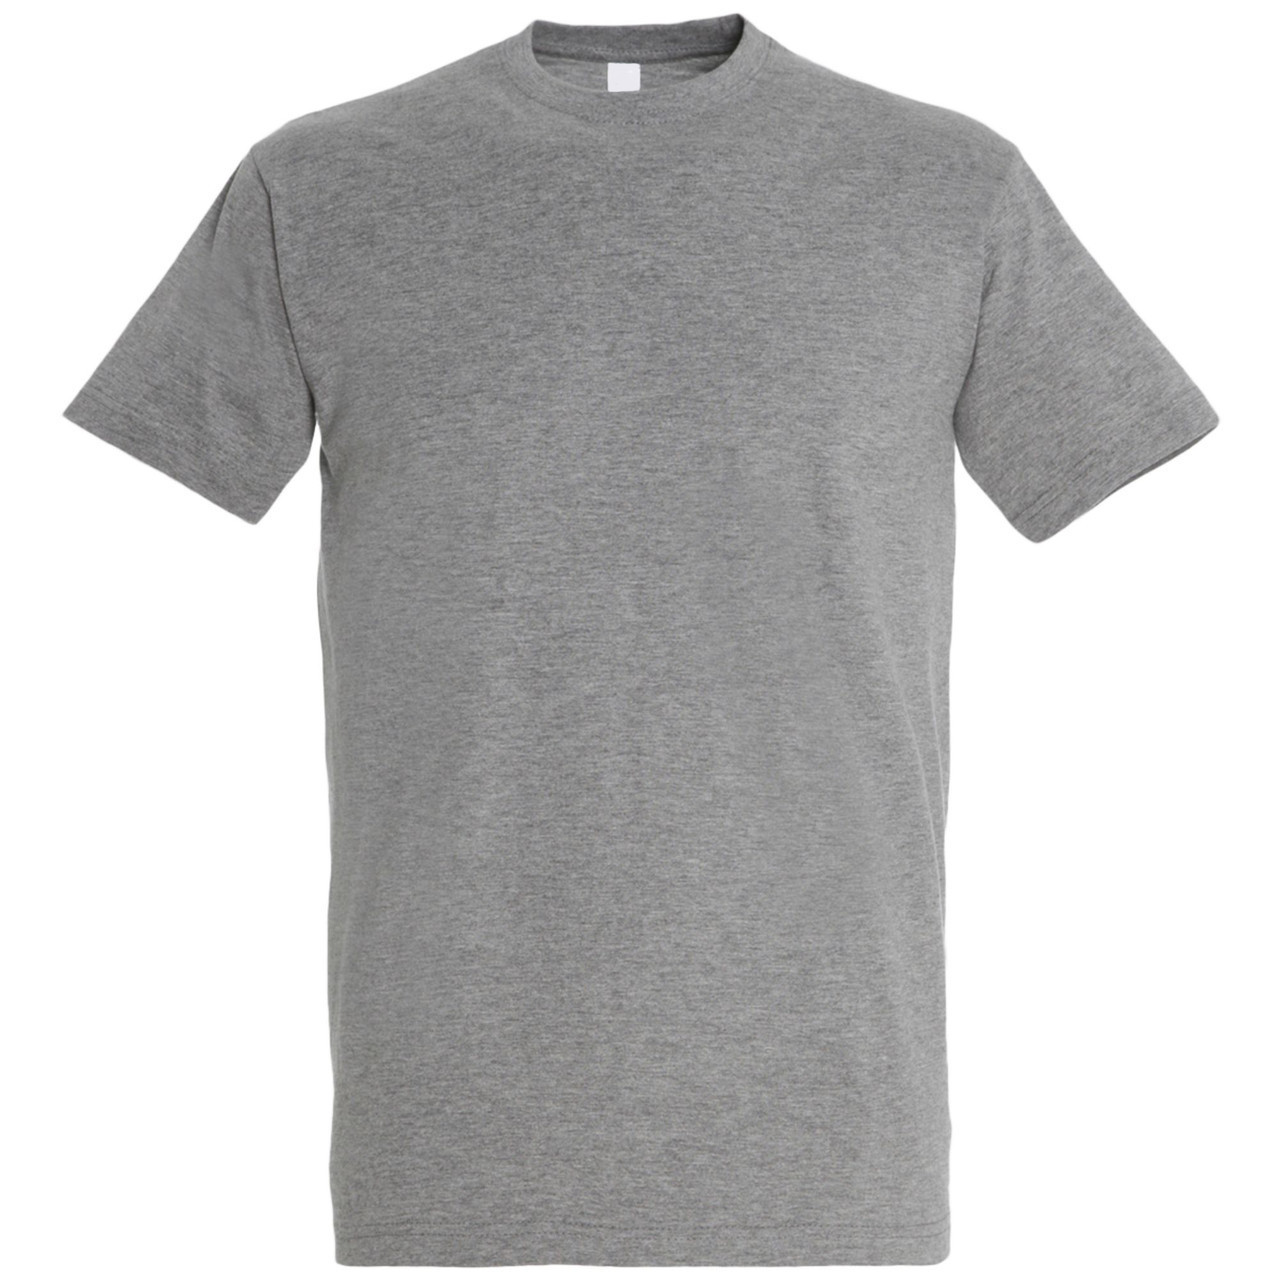 Oднотонная футболка   Серый меланж   160 гр.   M